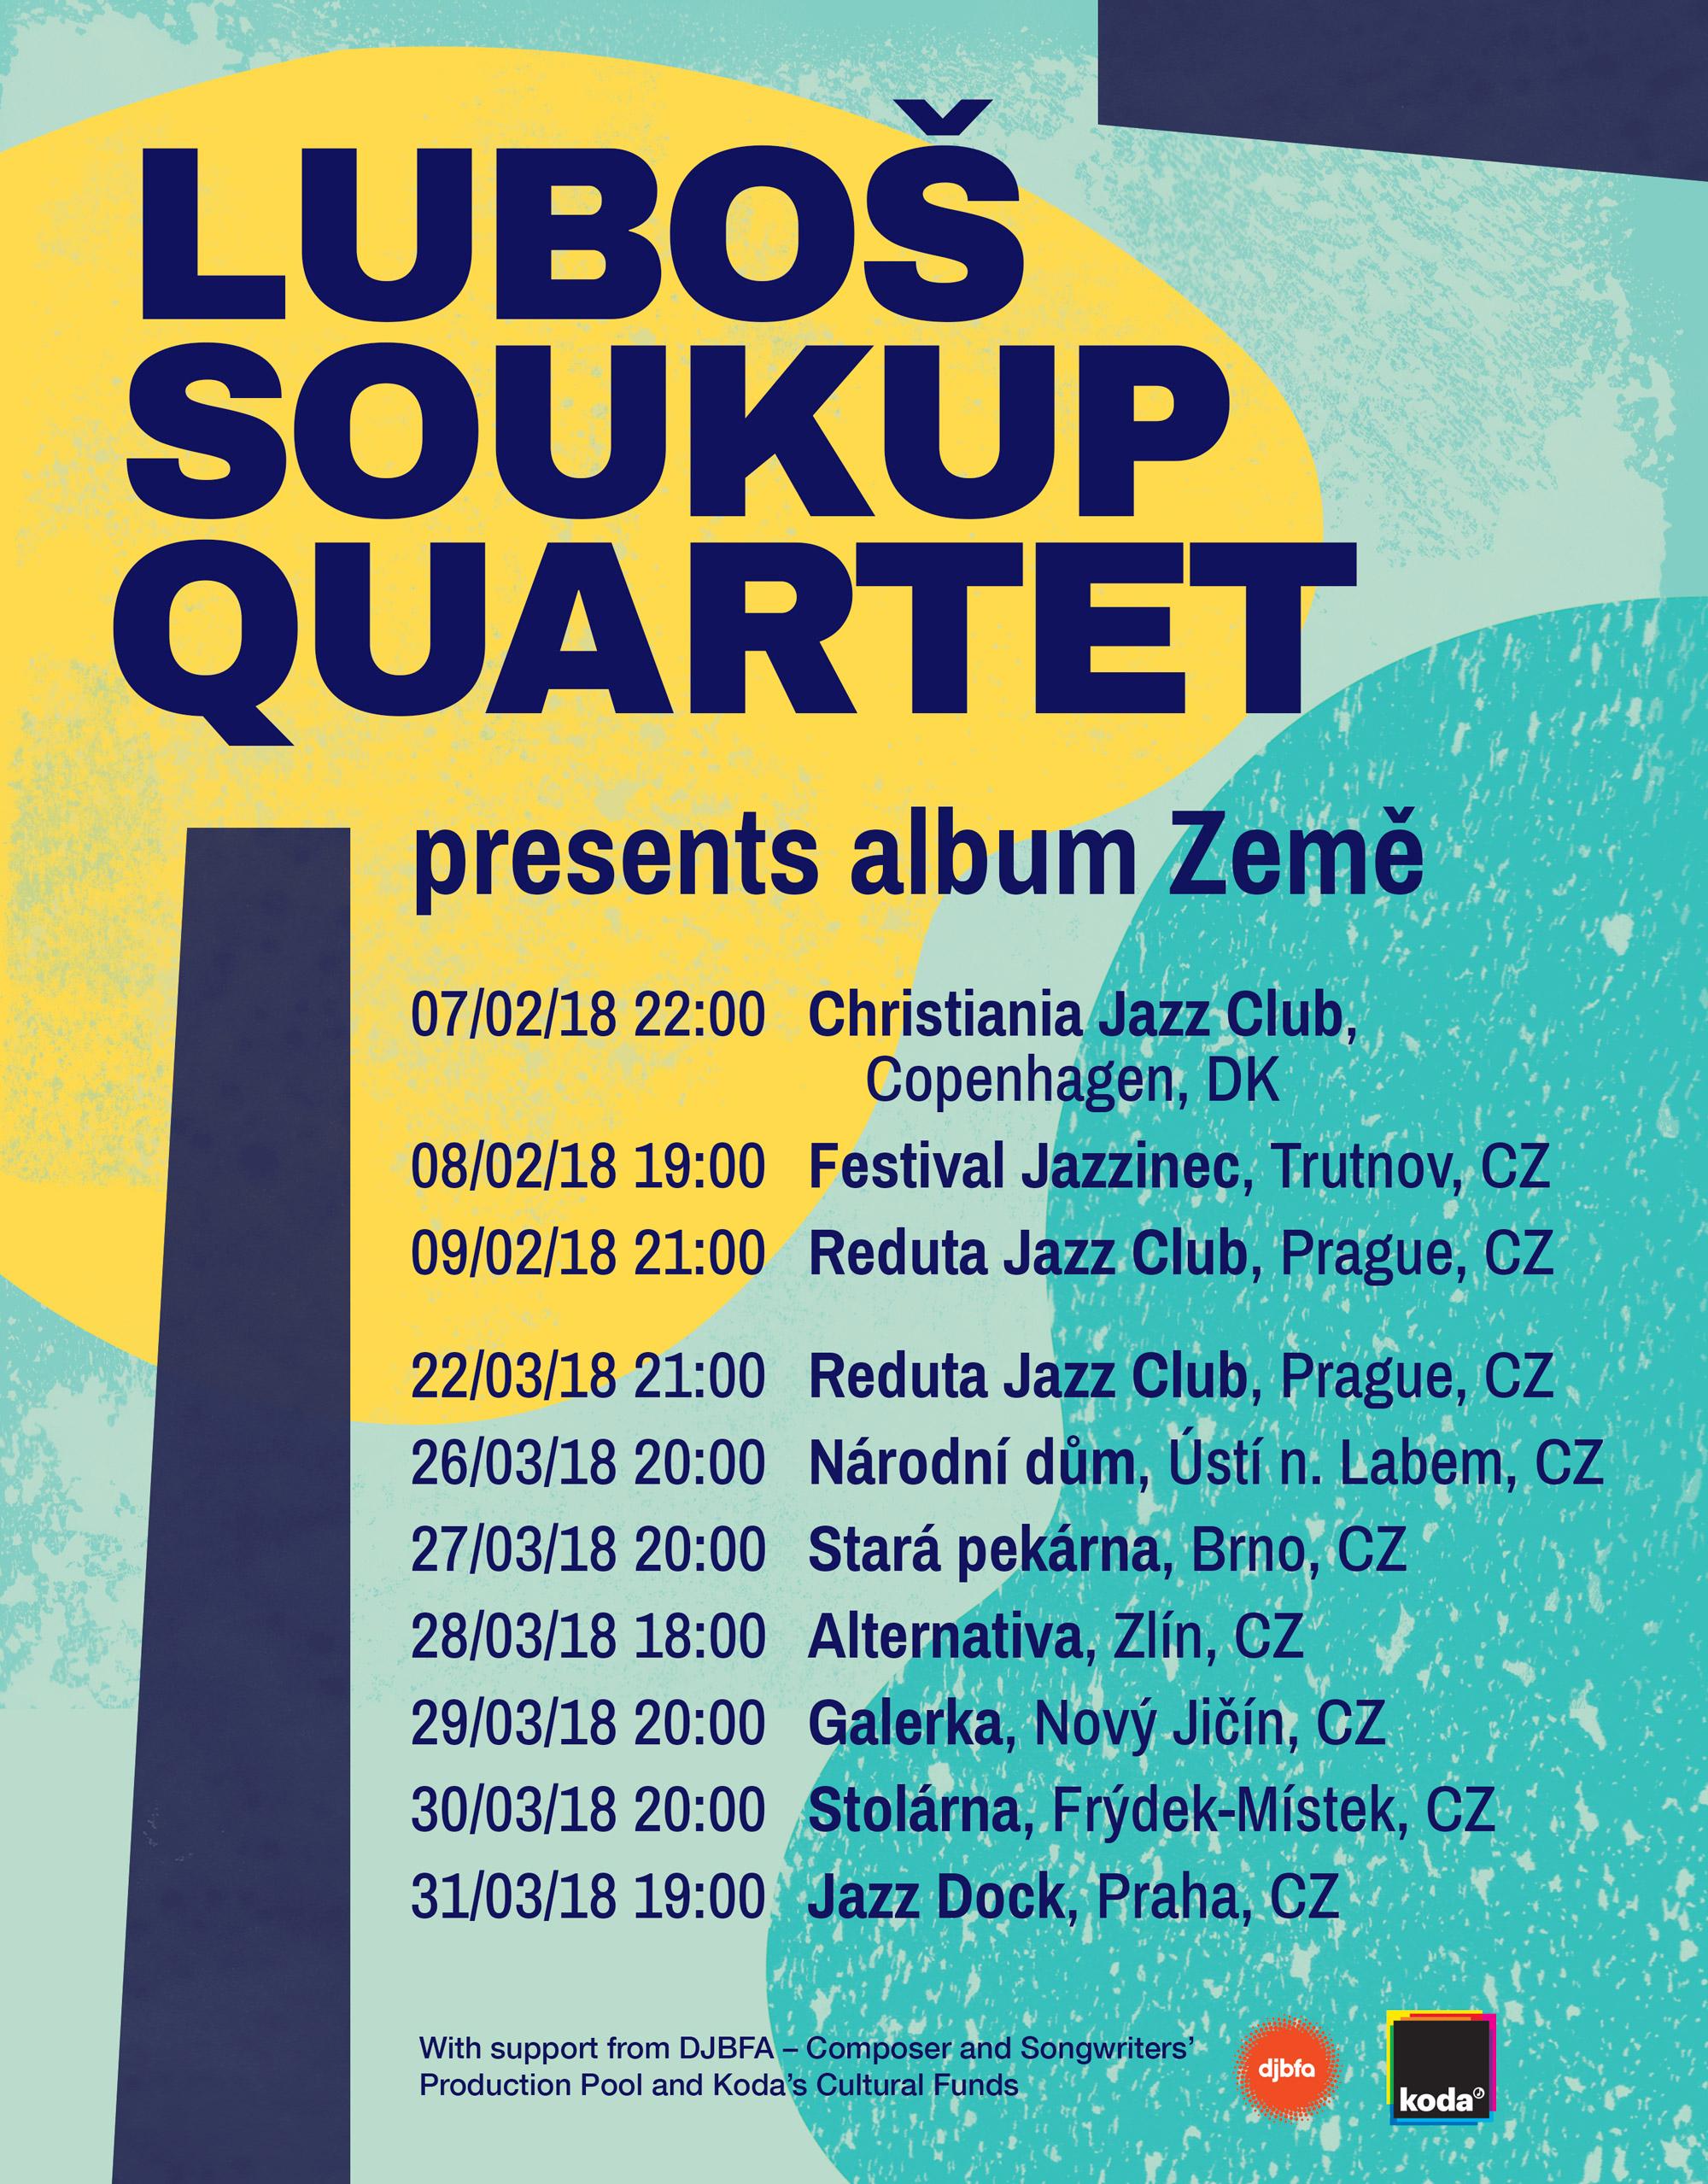 Lubos Soukup Quartet presenting album Zeme